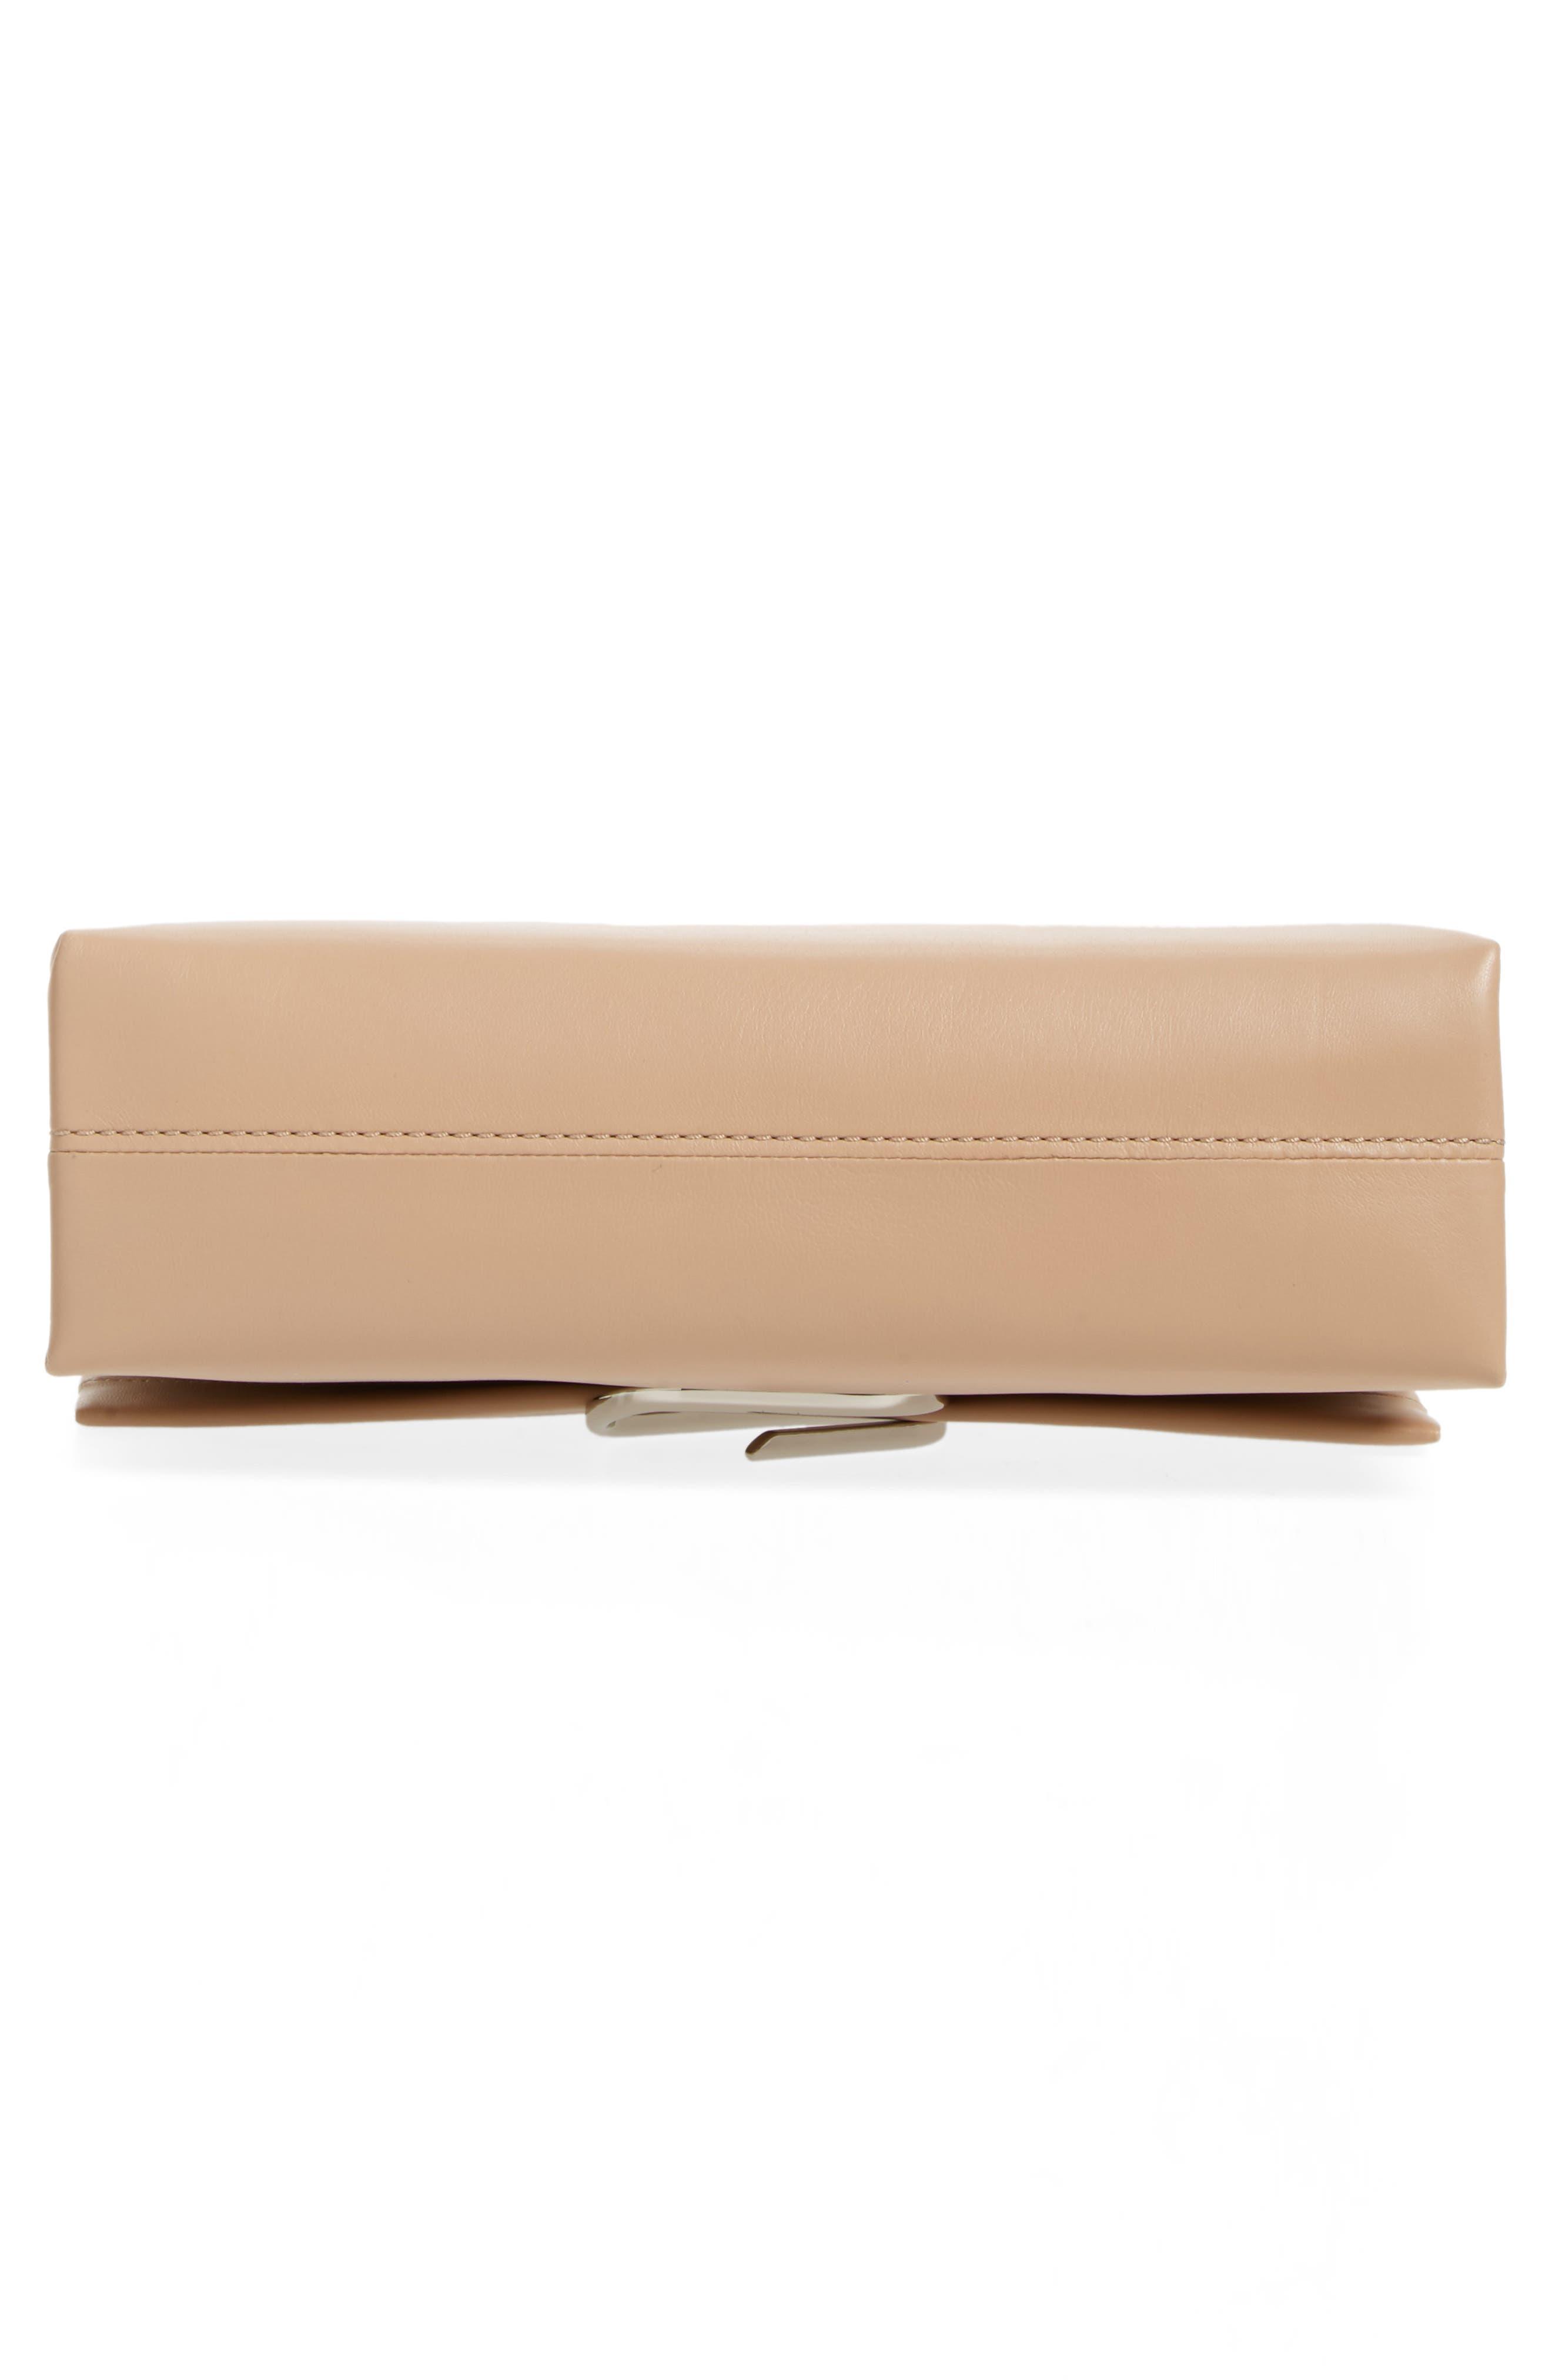 Oversized Alix Flap Leather Shoulder Bag,                             Alternate thumbnail 6, color,                             Fawn